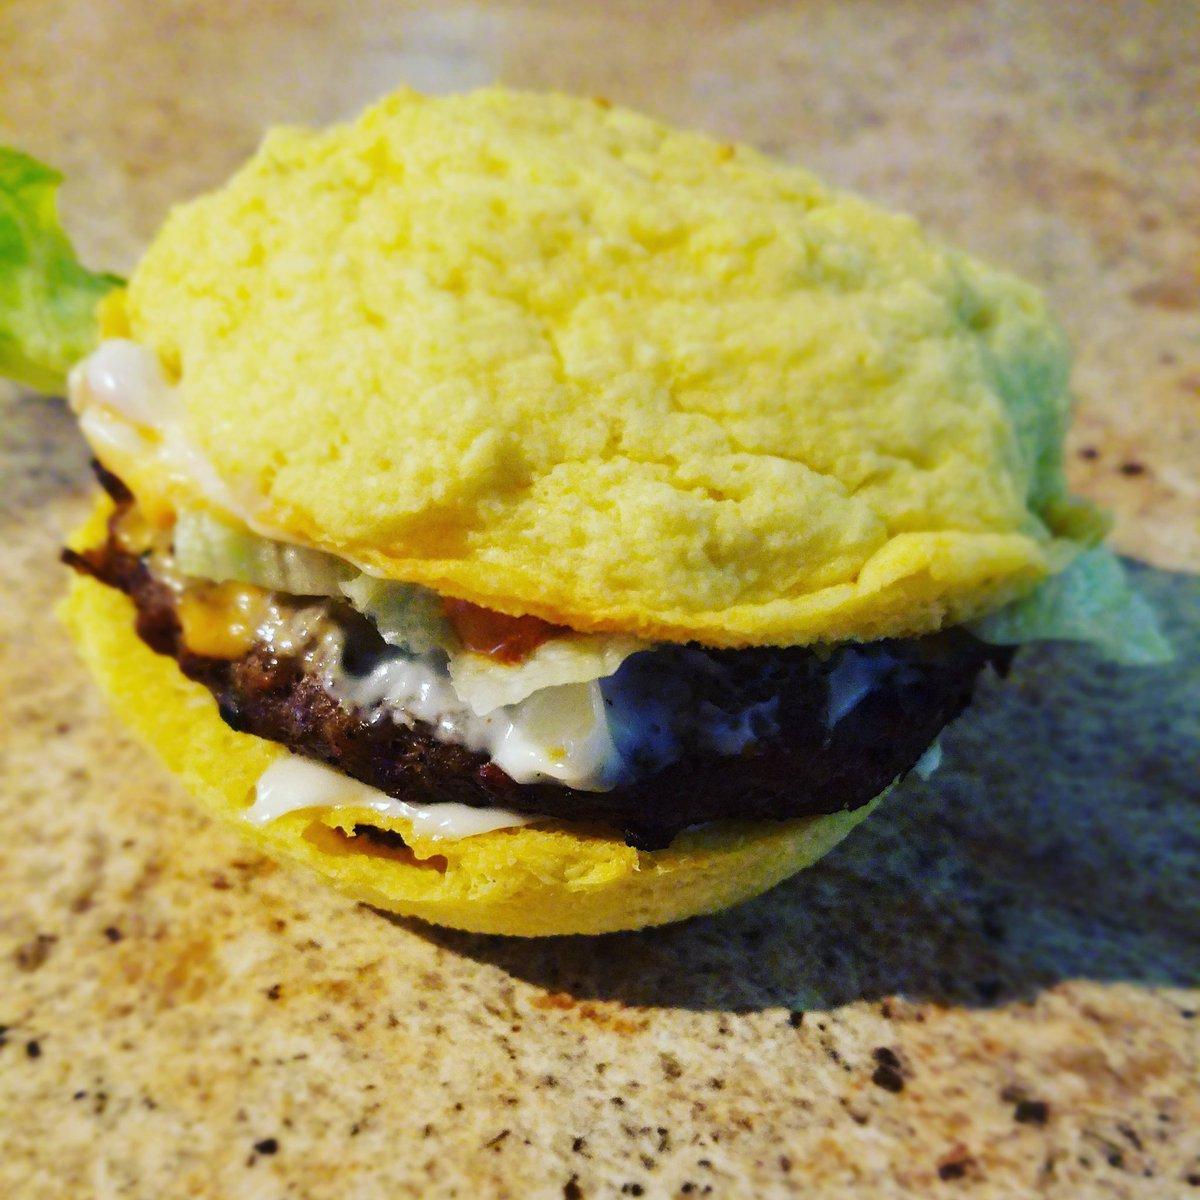 Hashtag Ketohamburger Sur Twitter